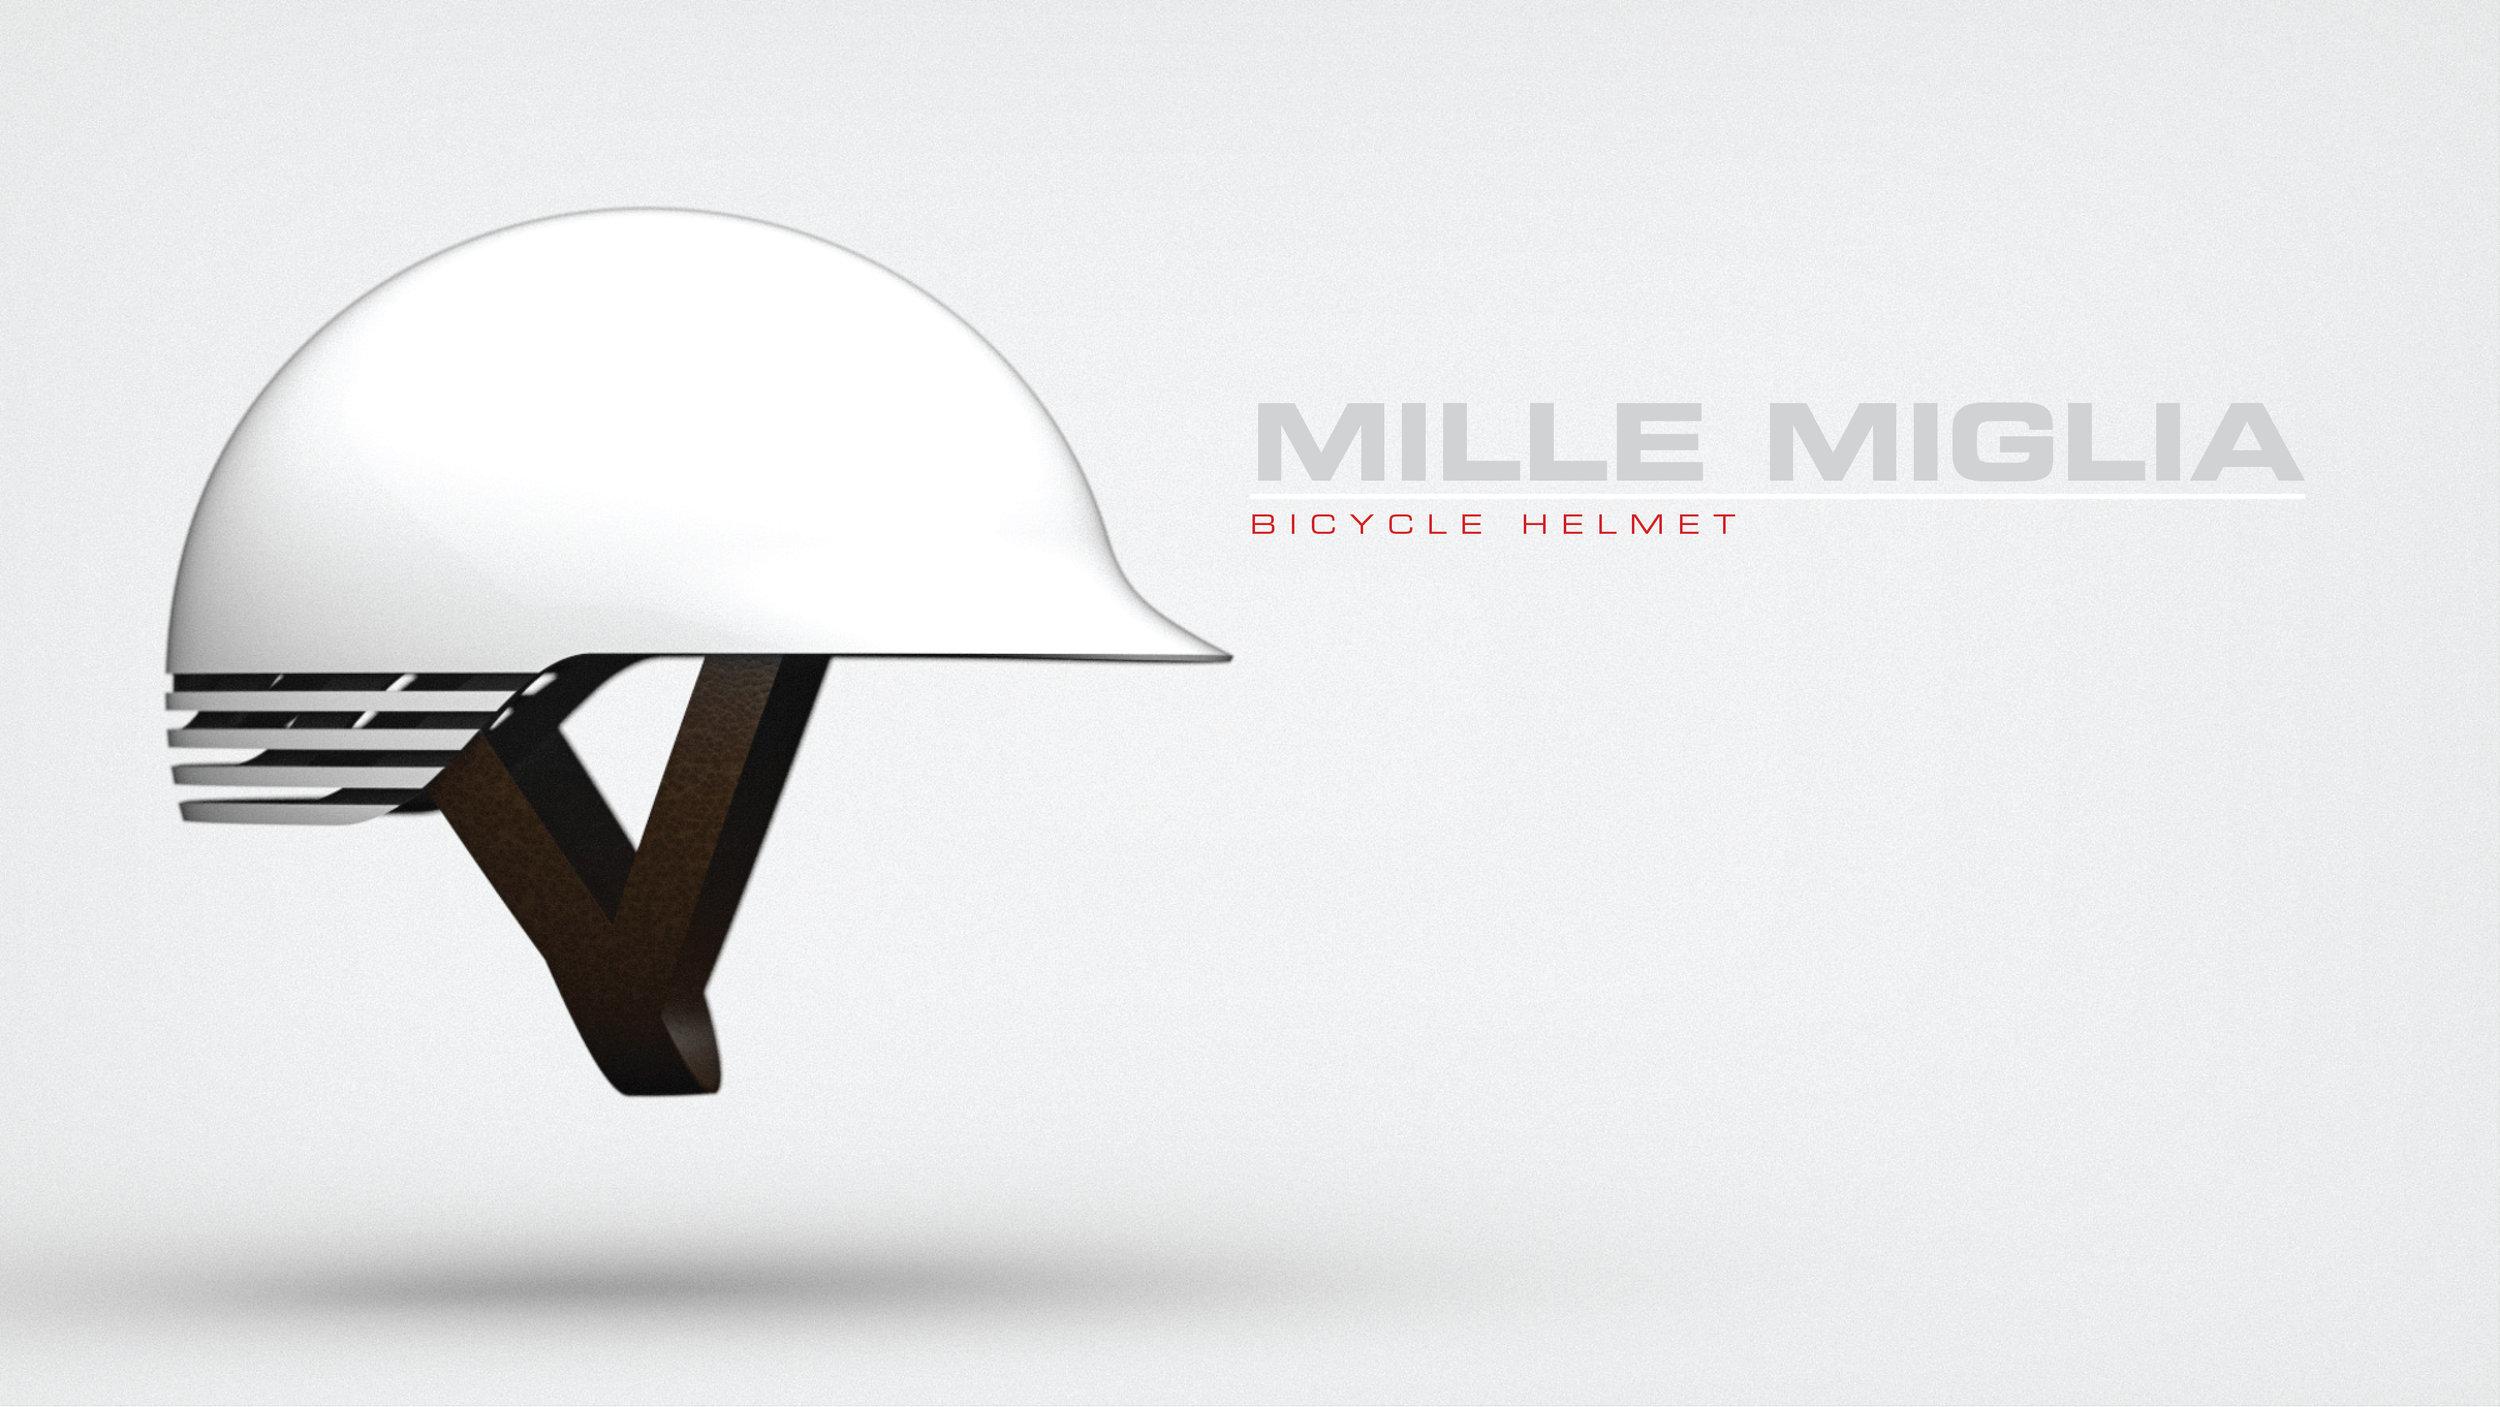 mille miglia helmet-02.jpg